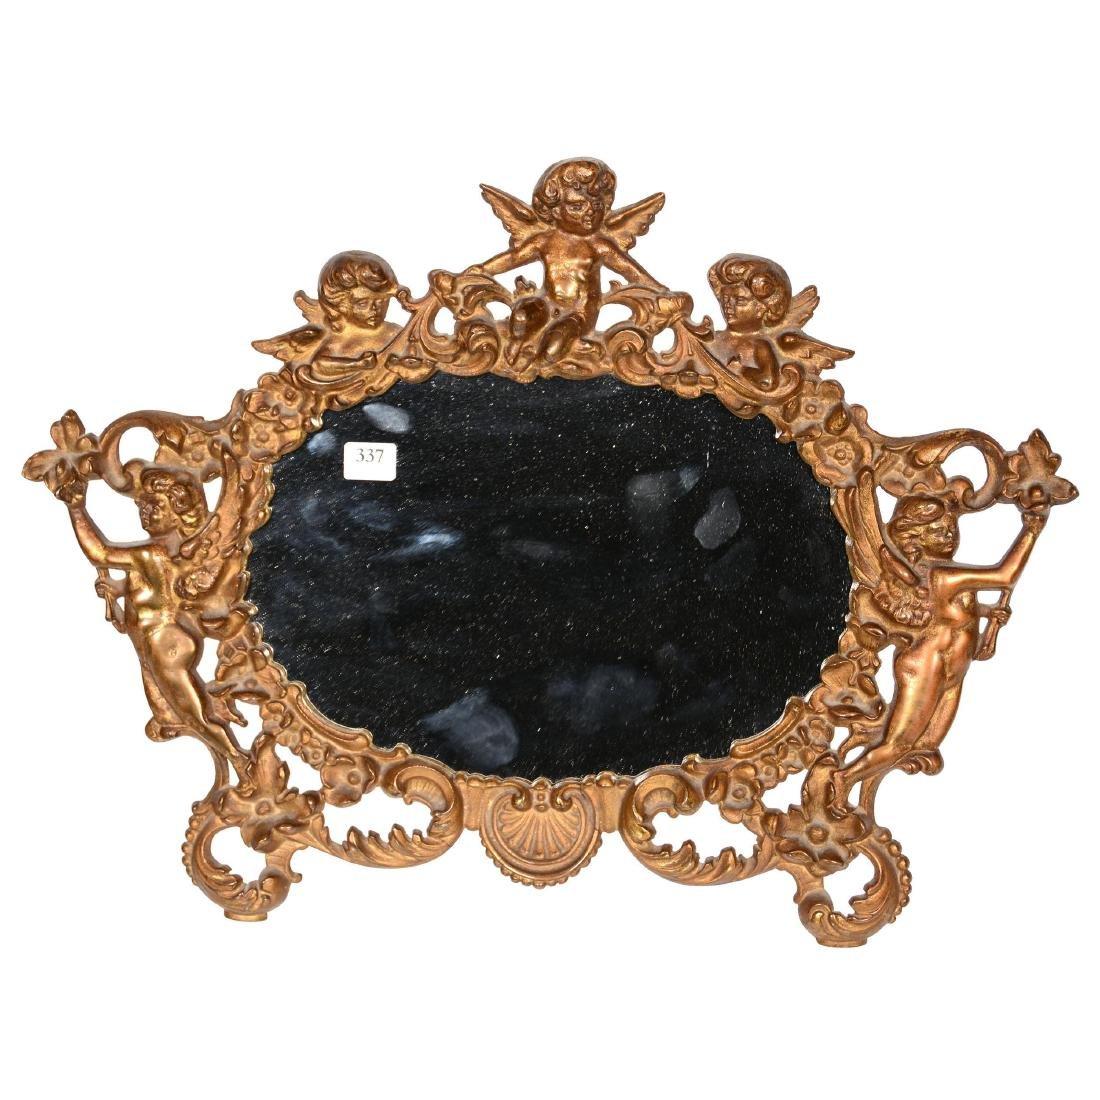 Ornate Brass Framed Stand-Up Mirror